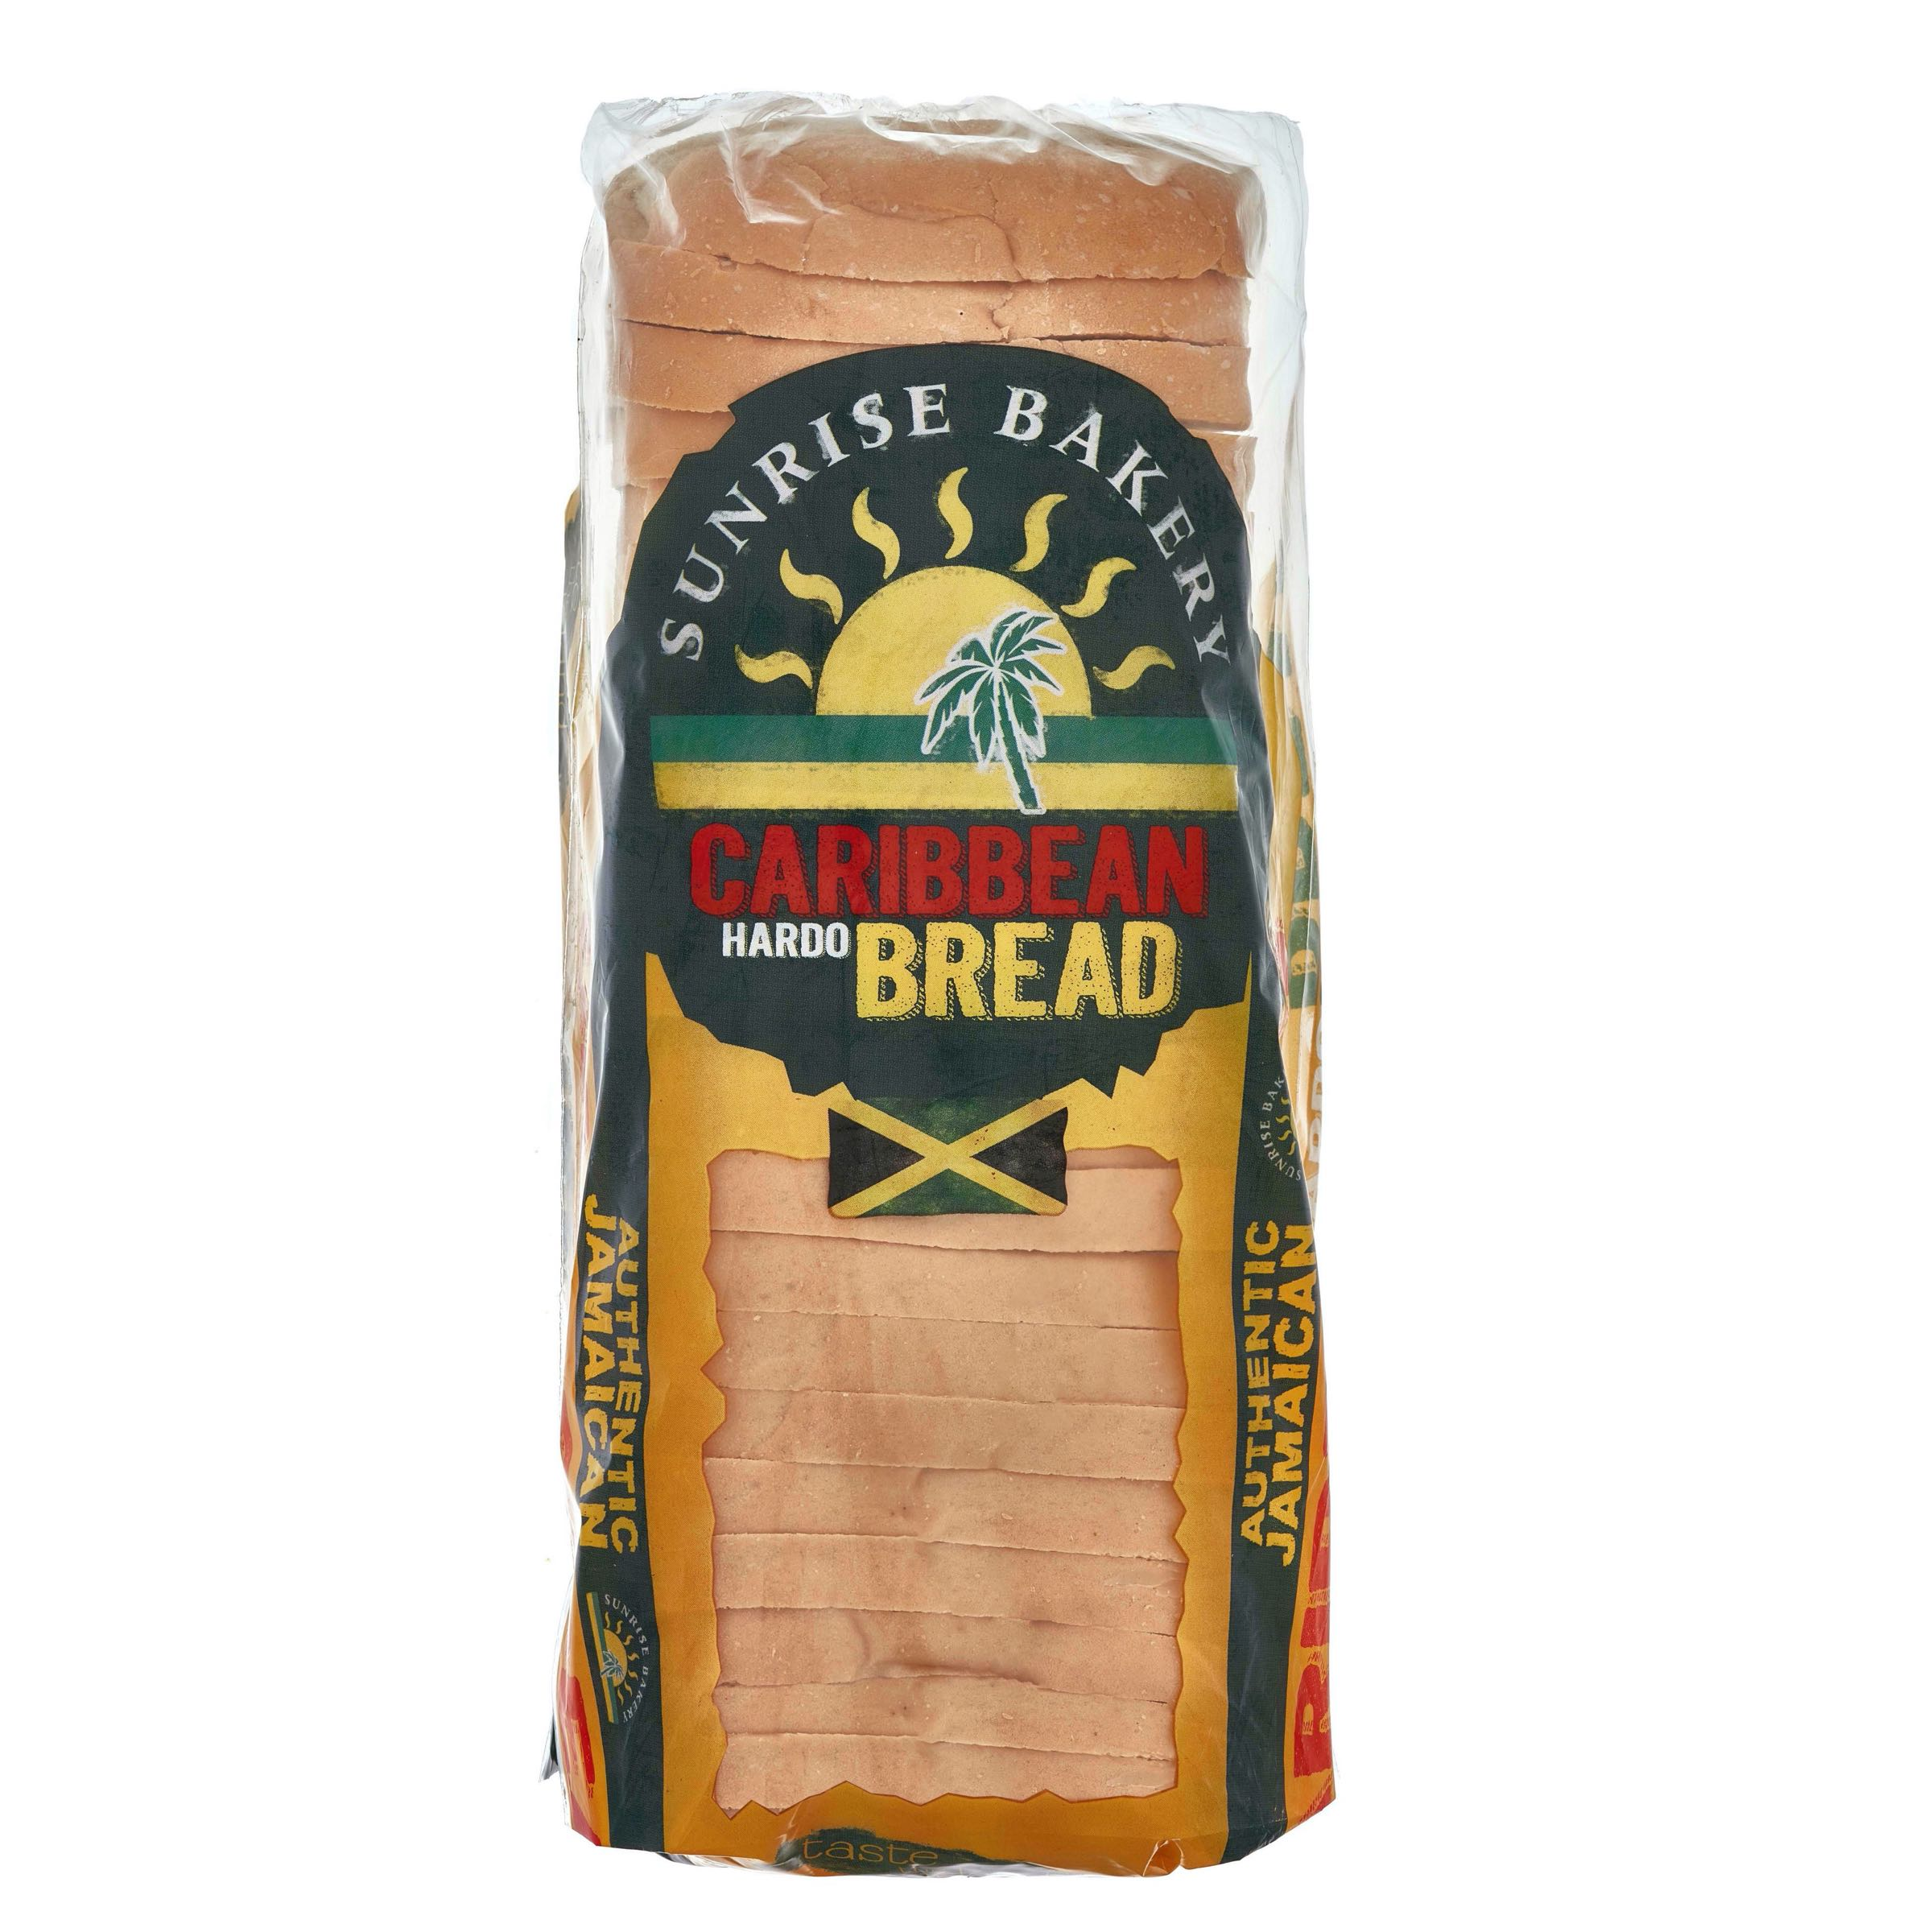 Sunrise Bakery Sliced Caribbean Hardo Bread